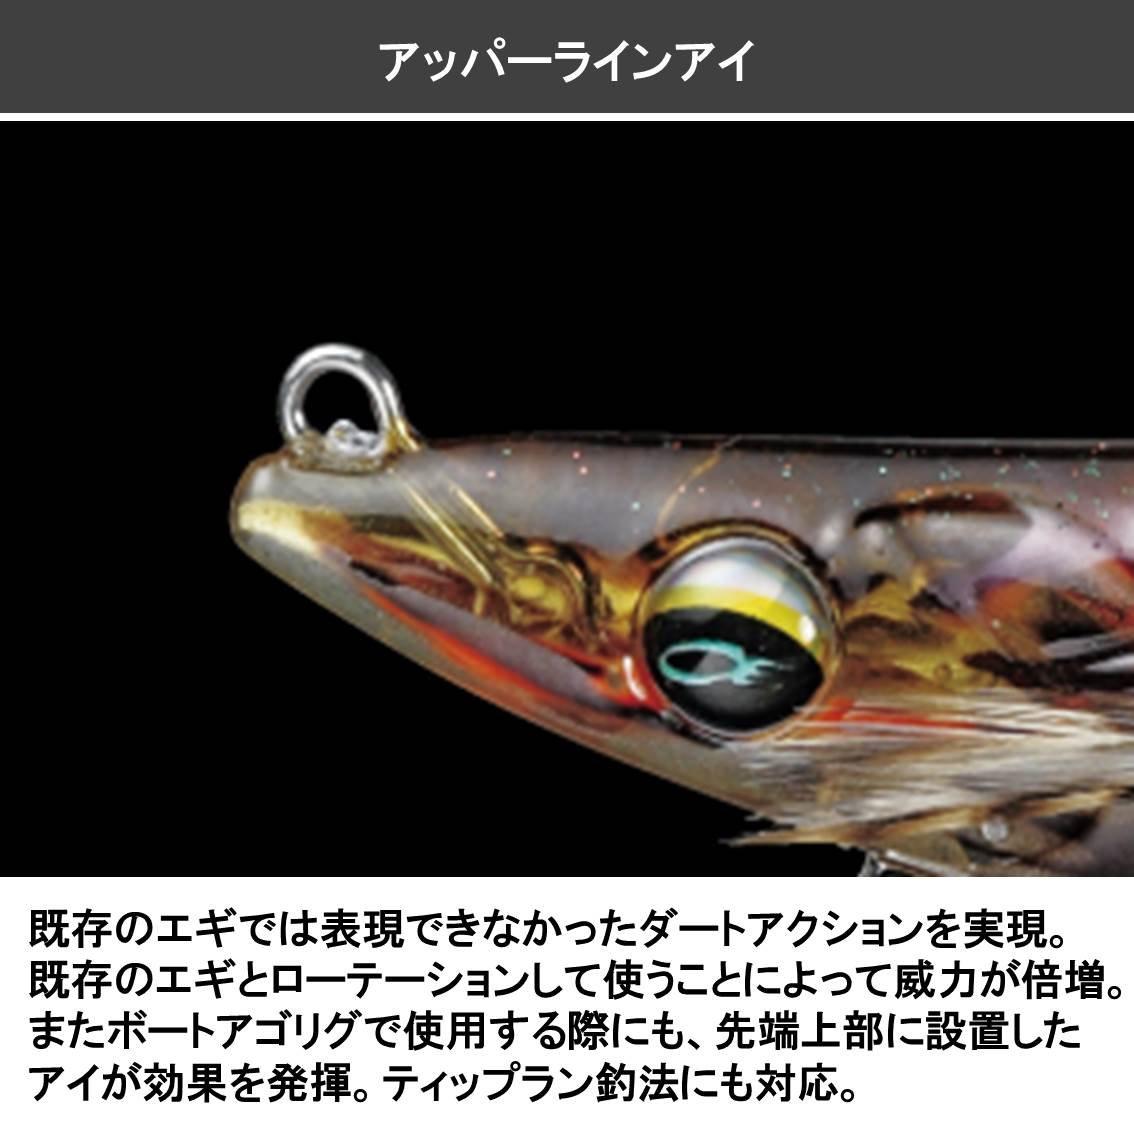 Daiwa Oita EMERALDAS Nude Squid Jig 3.5# Burning Shrimp